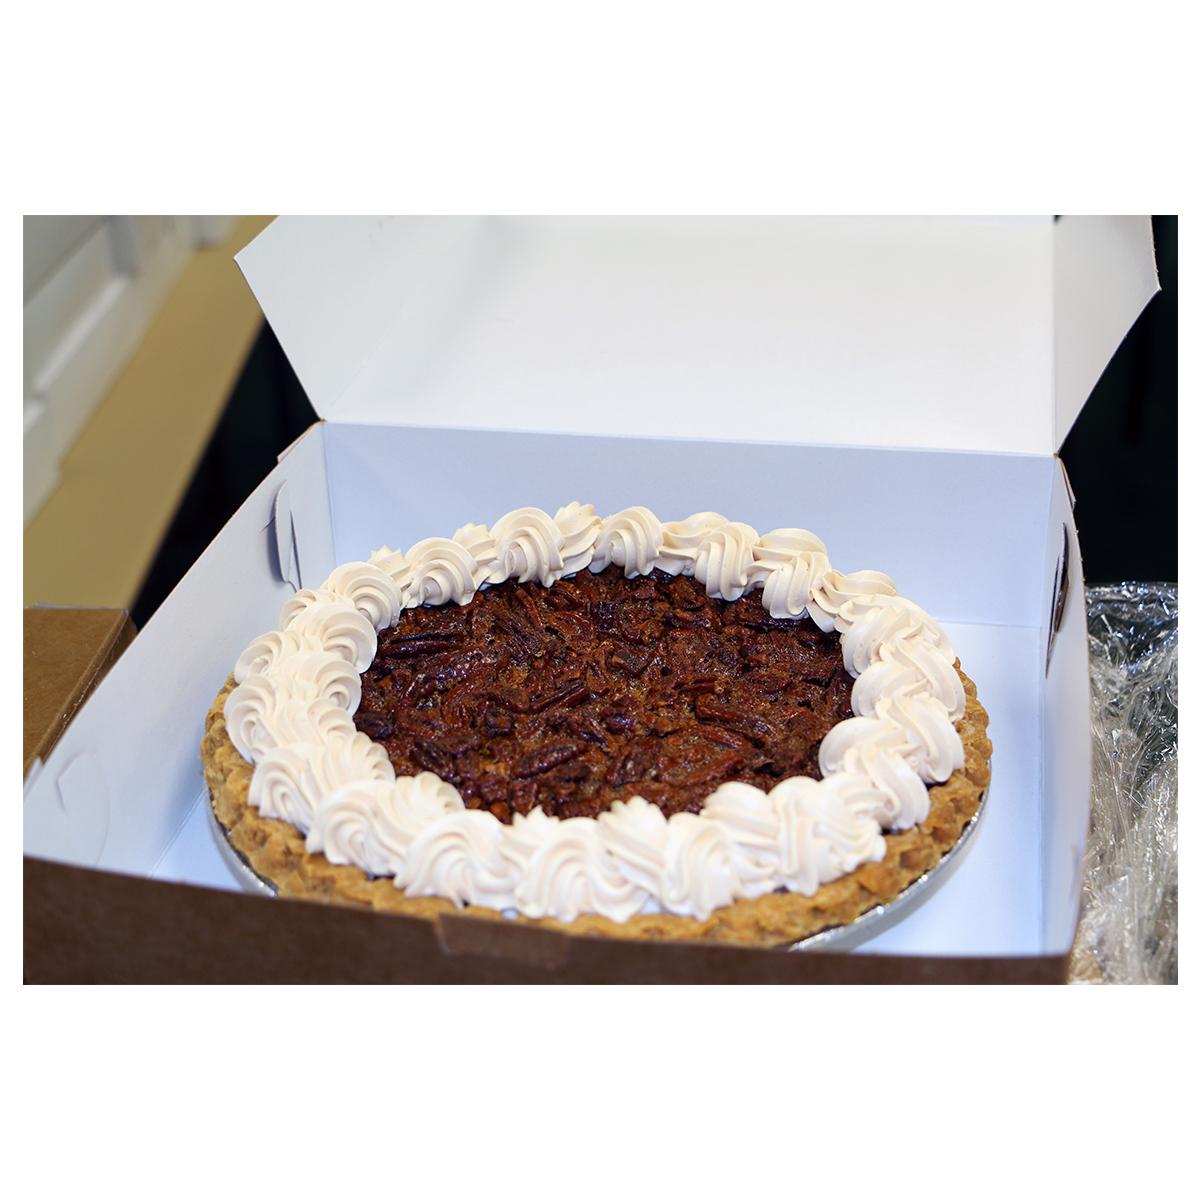 Pecan Pie Picture -